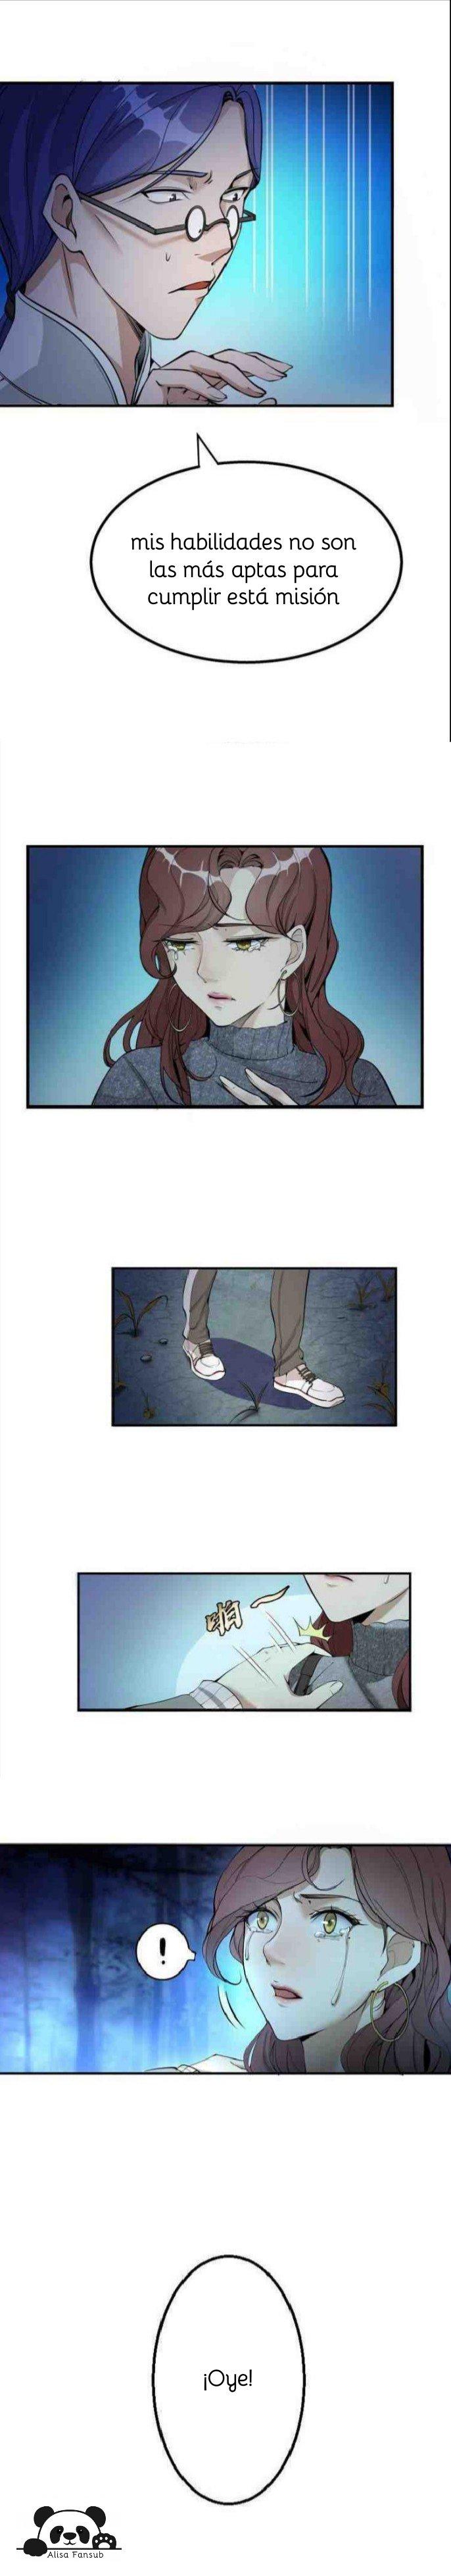 https://nine.mangadogs.com/es_manga/pic9/49/37681/970955/22c5a901070d1c2ad33e821d071ae97e.jpg Page 8